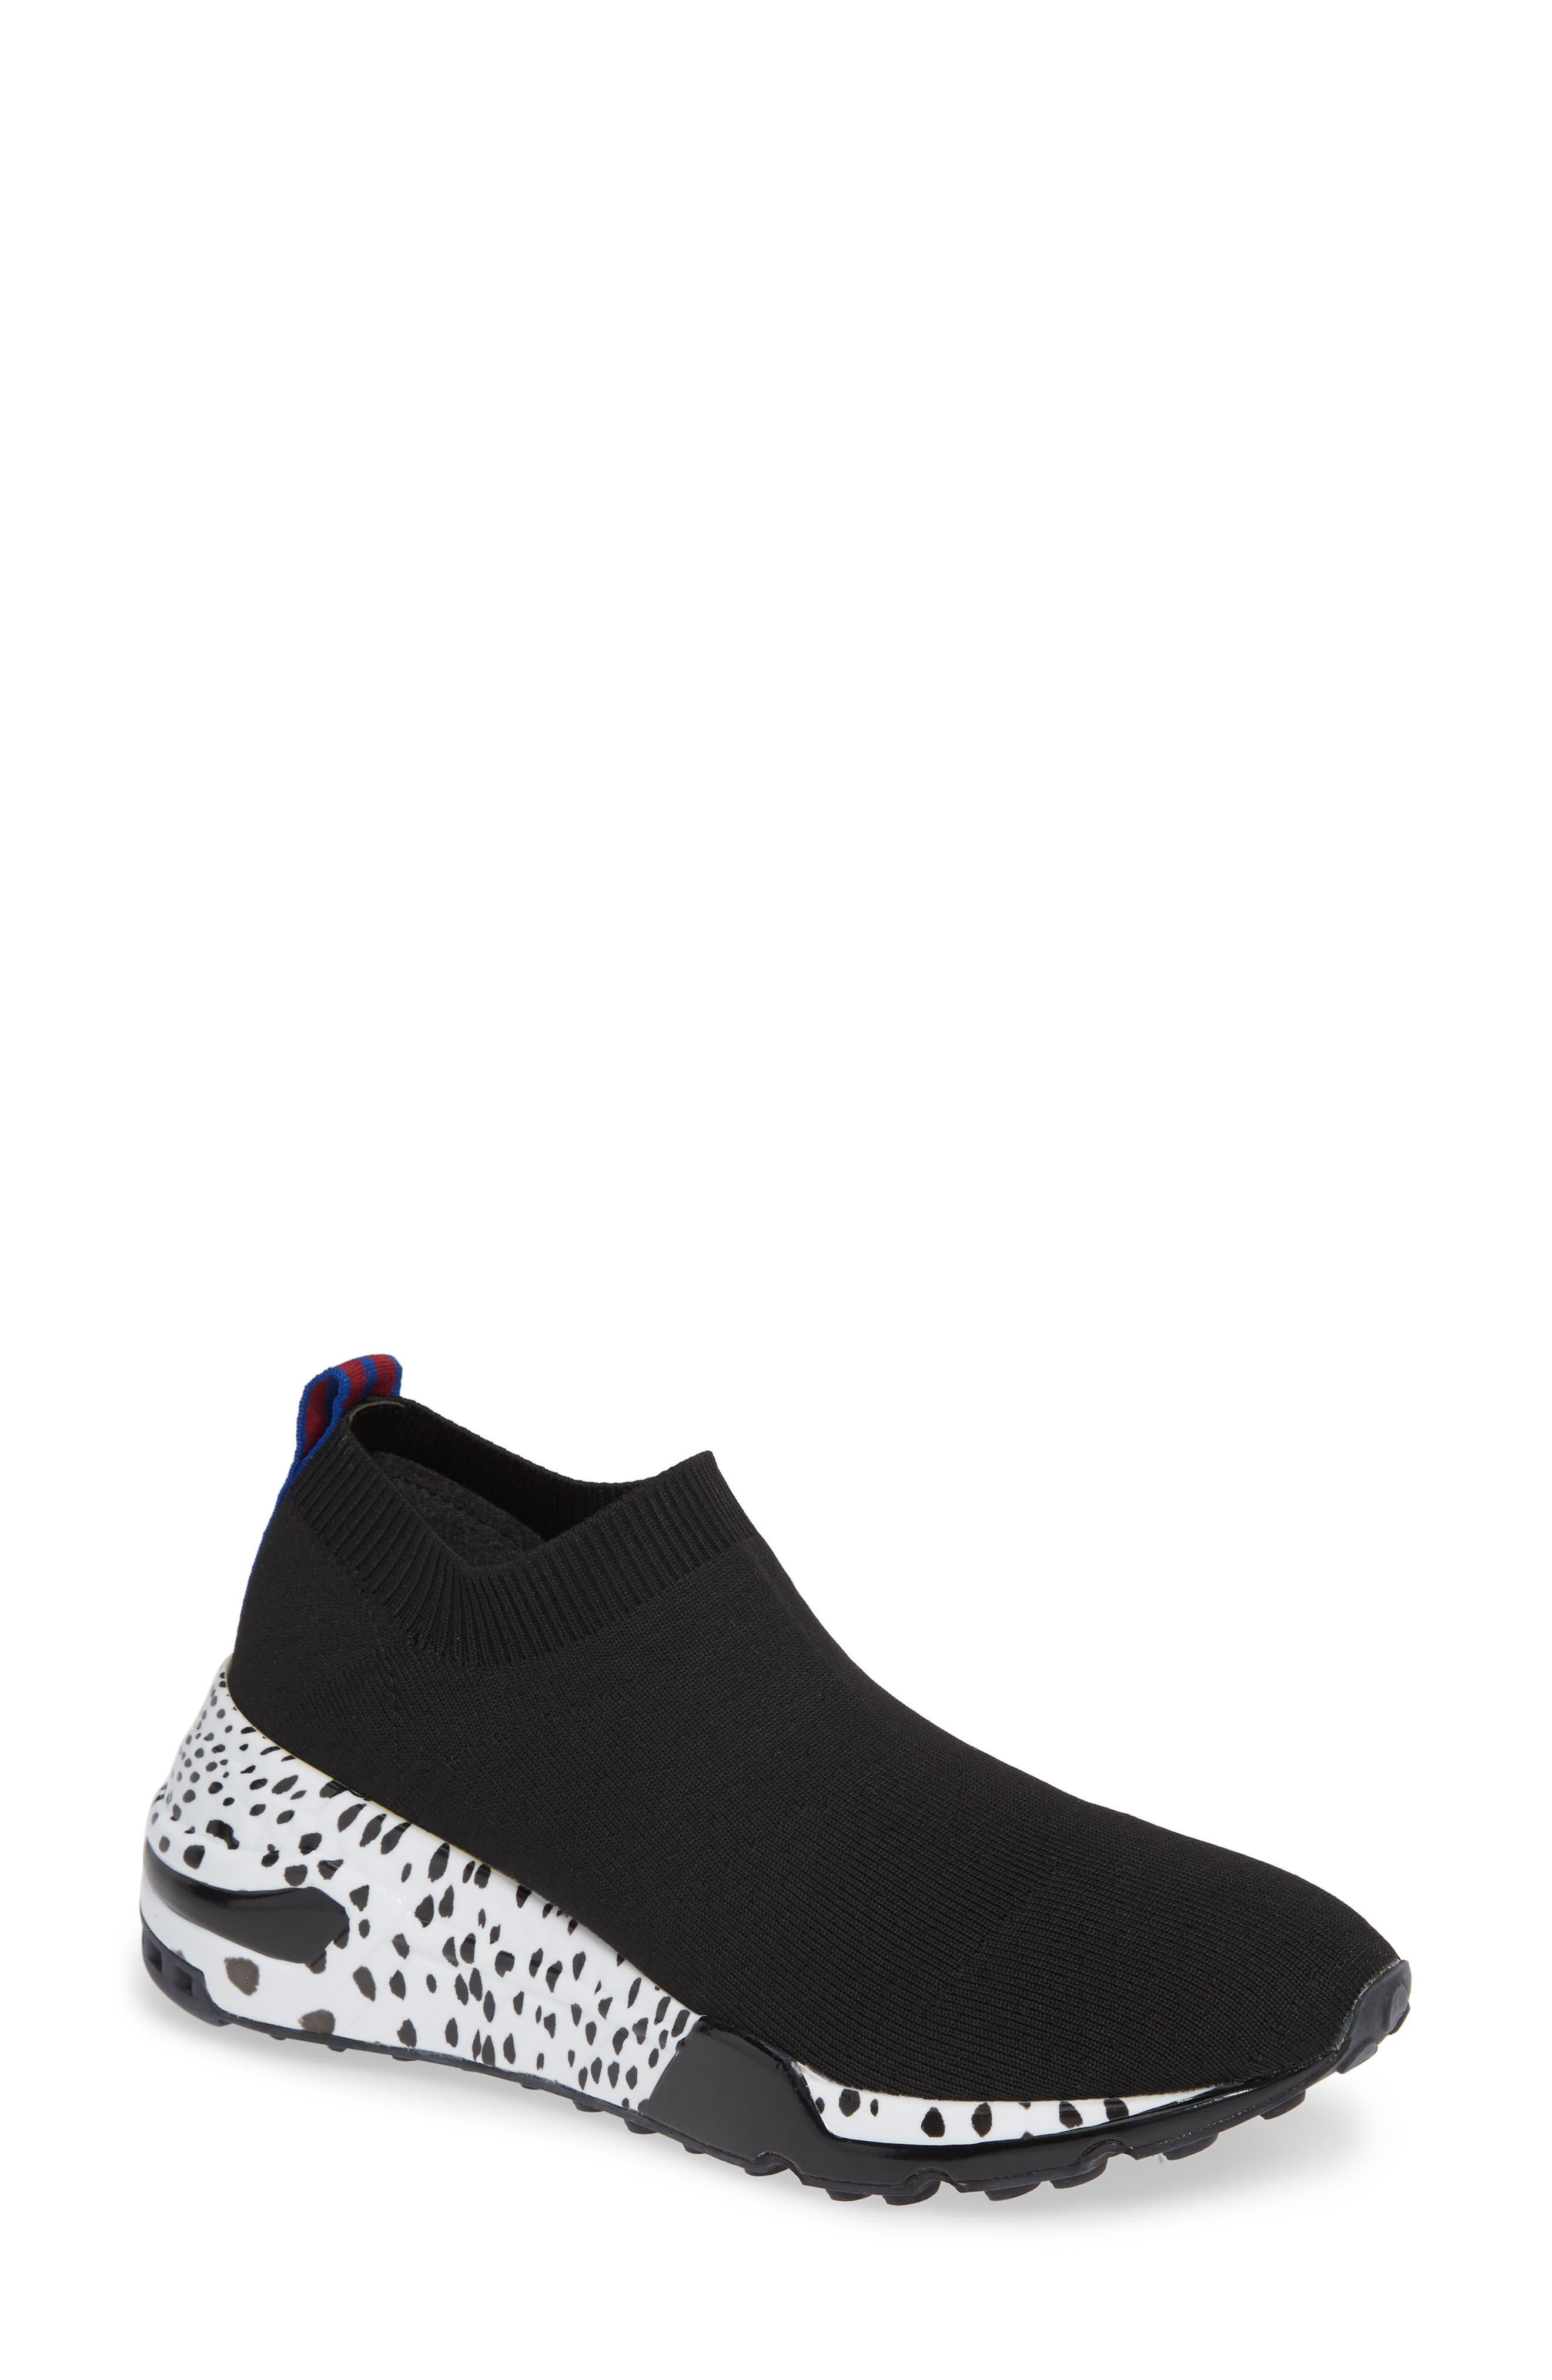 Steve Madden | Cloud Sock Wedge Sneaker